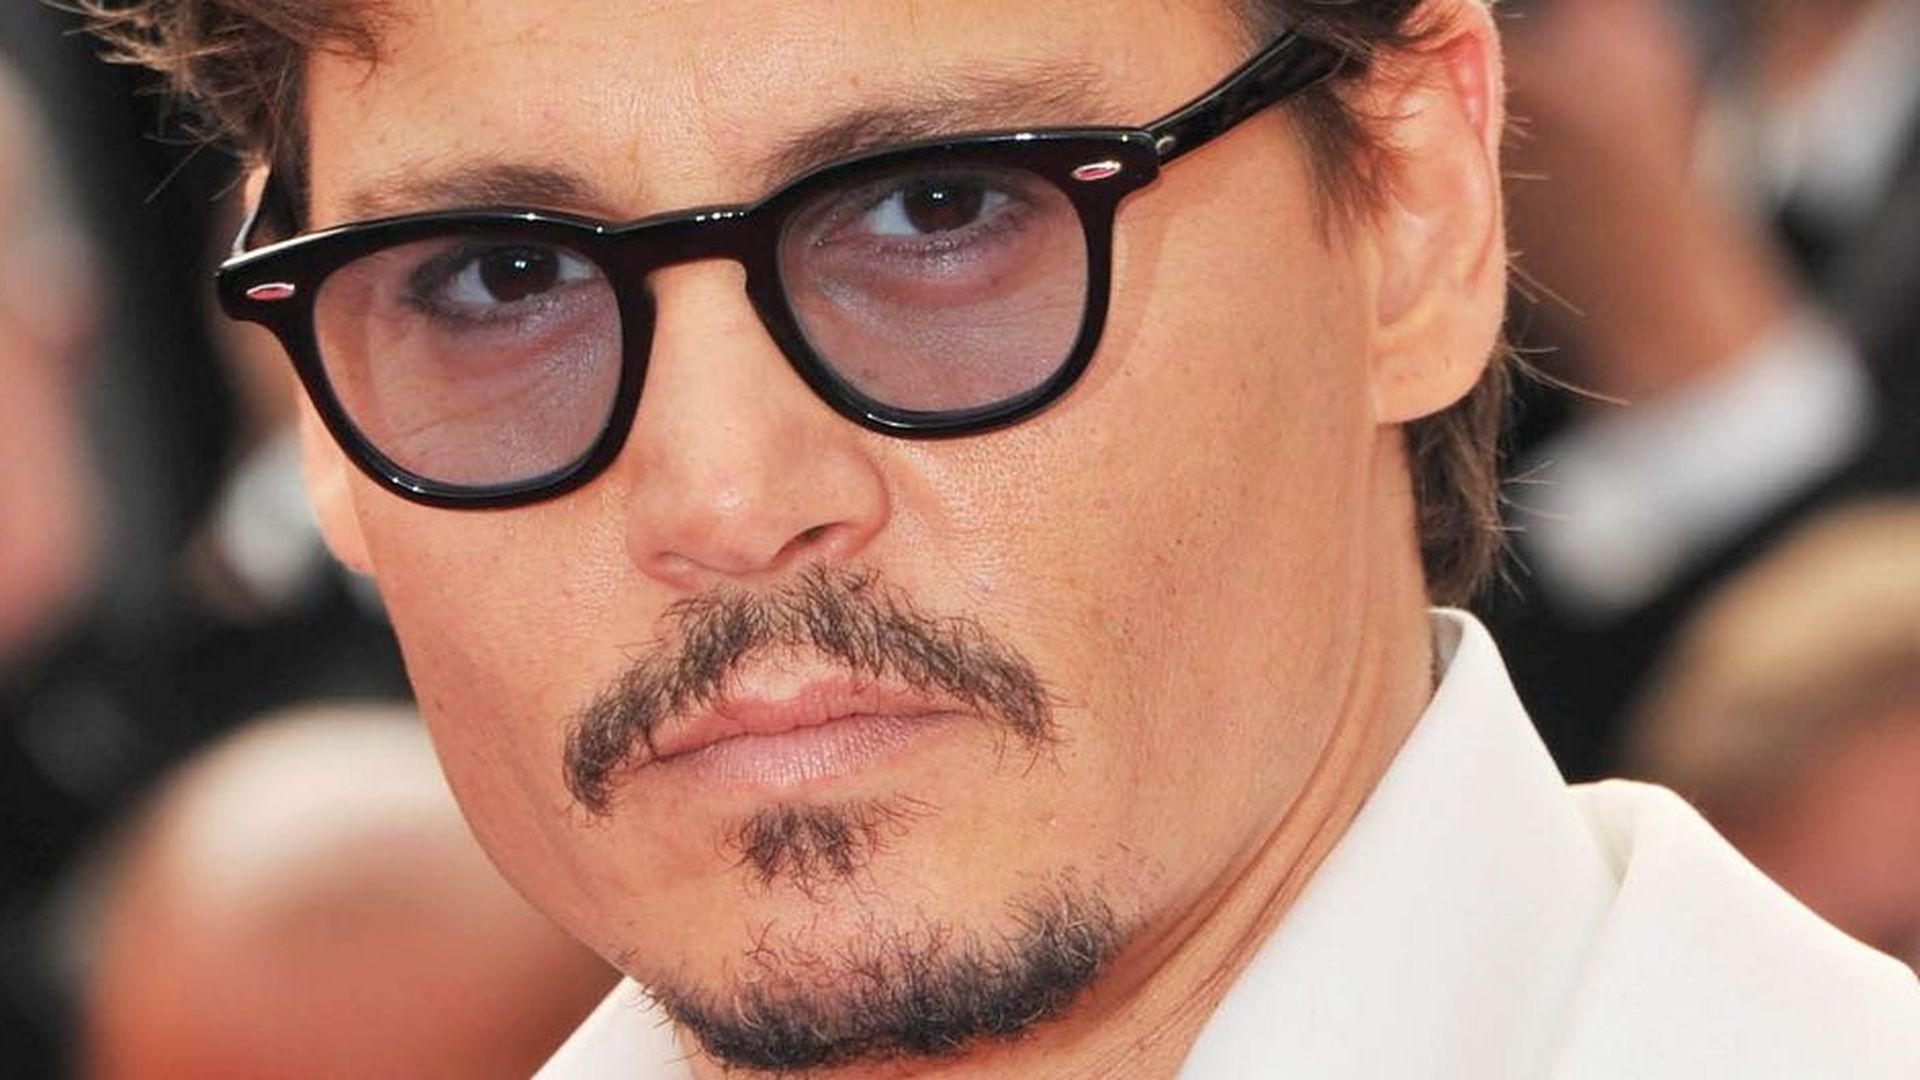 Johnny Depp bereut Vergewaltigungs-Vergleich | Promiflash.de Johnny Depp/newspaper Articles